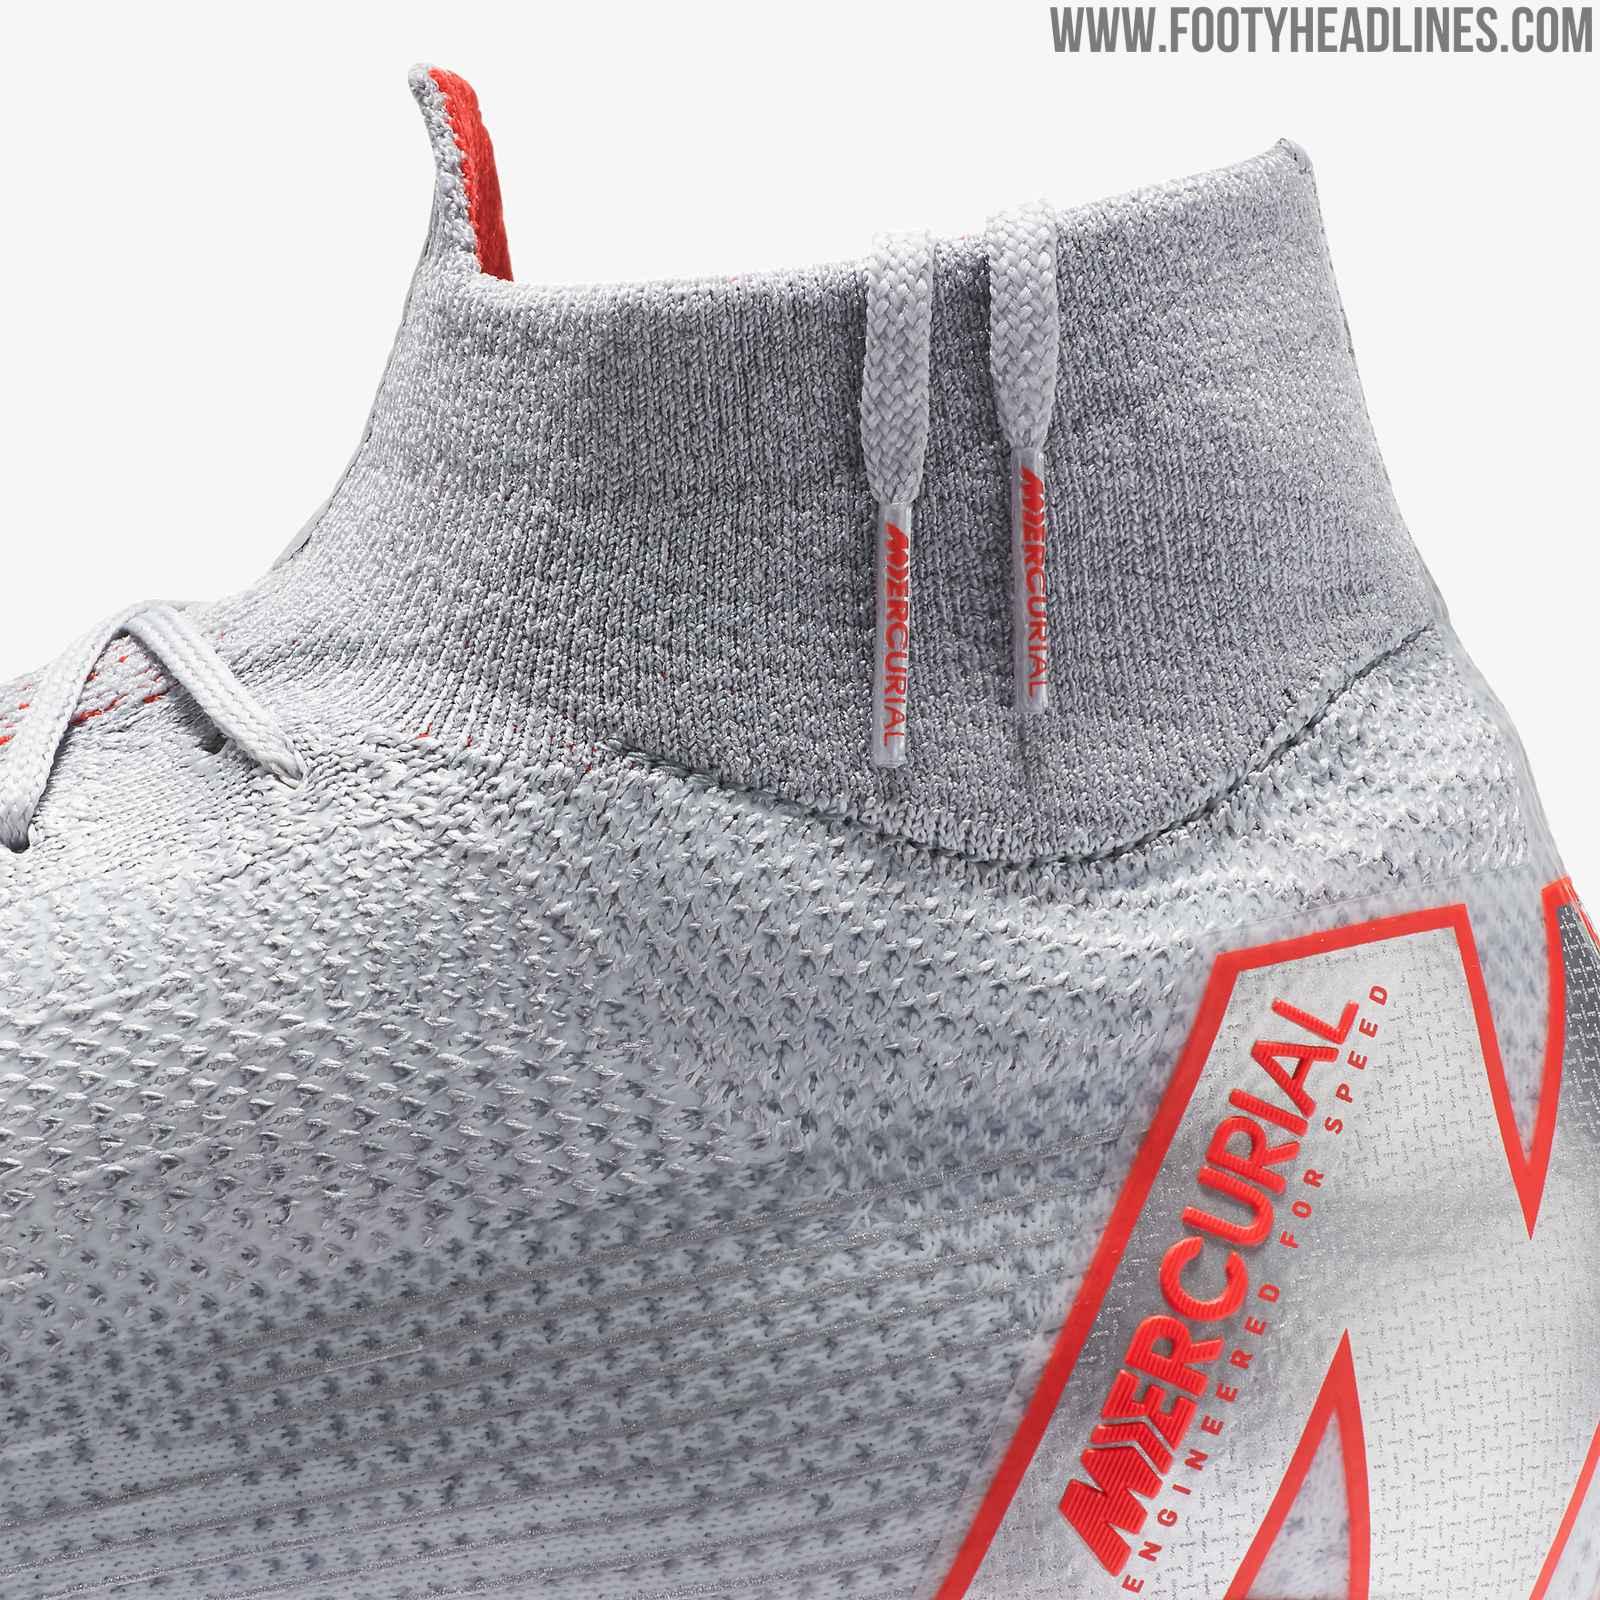 buy online 9cf73 82624 Silver Nike Mercurial Superfly 360 'Raised on Concrete' 2018 ...